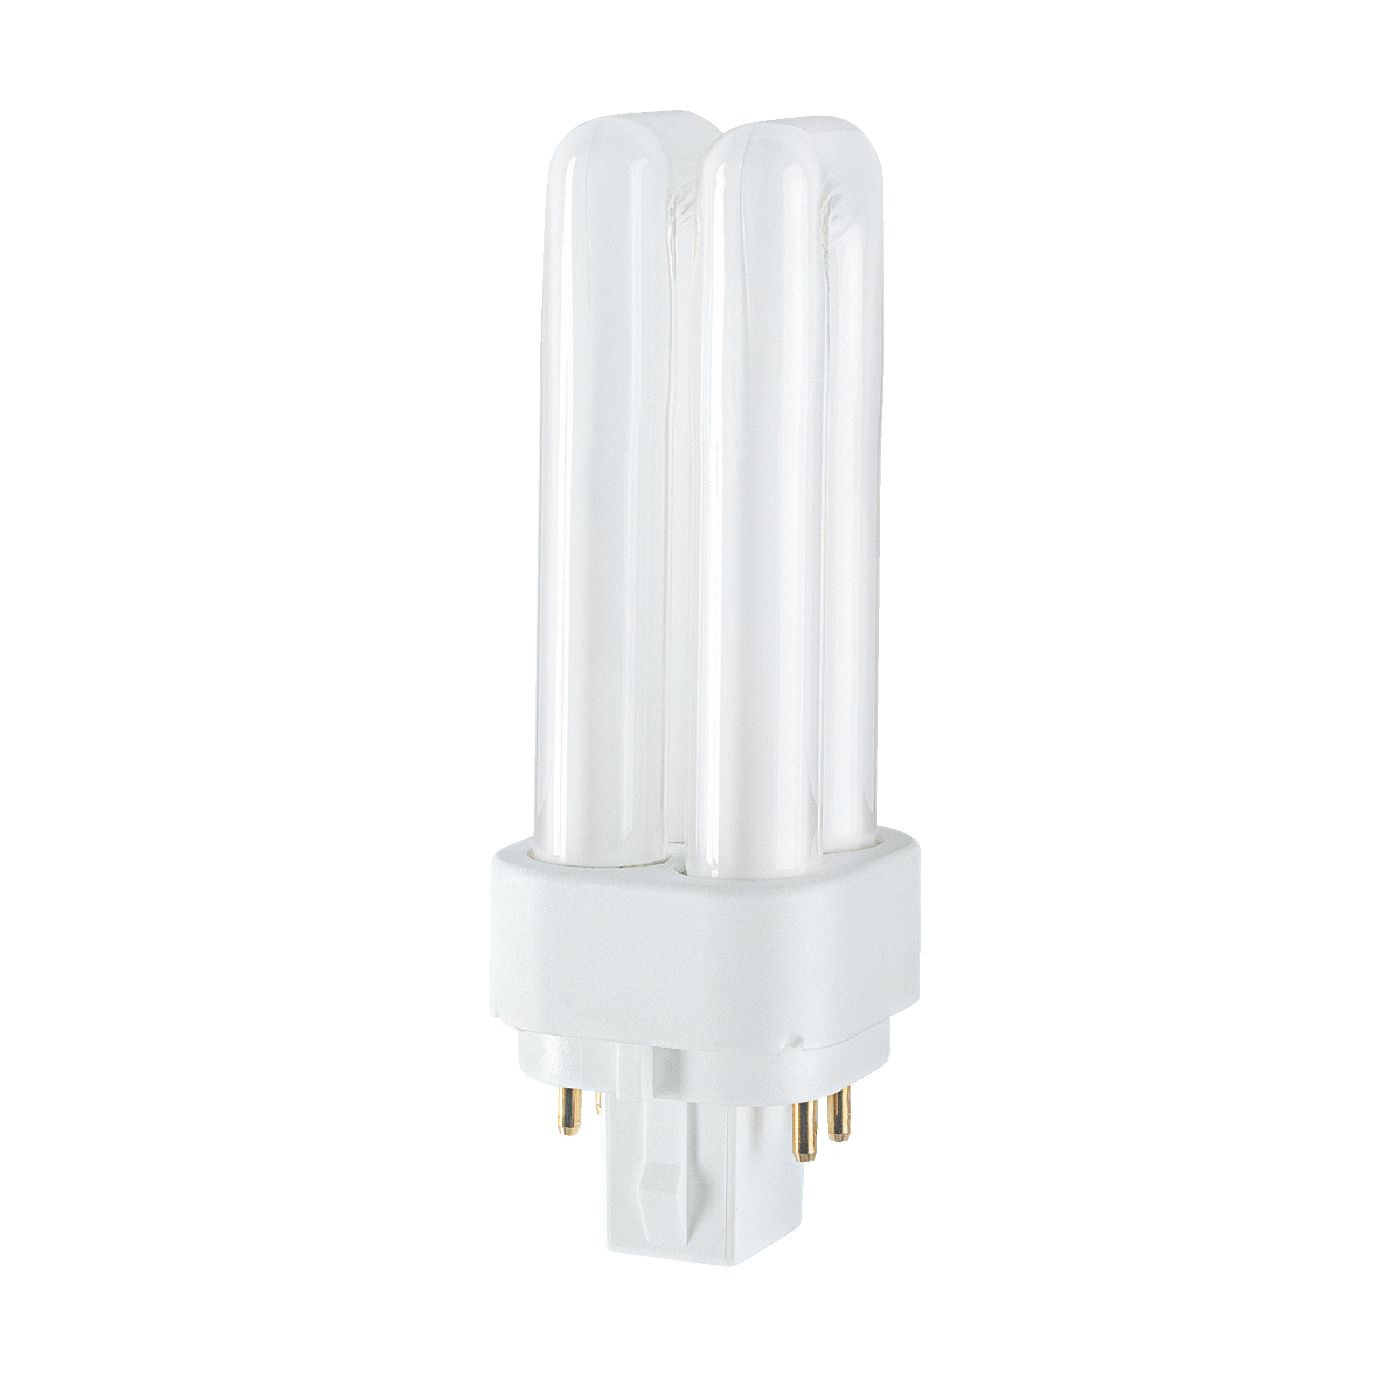 Osram Kompaktleuchtstofflampe Zweifach-Doppelrohr TC-DEL 26W/830 G24q-3 warmweiß